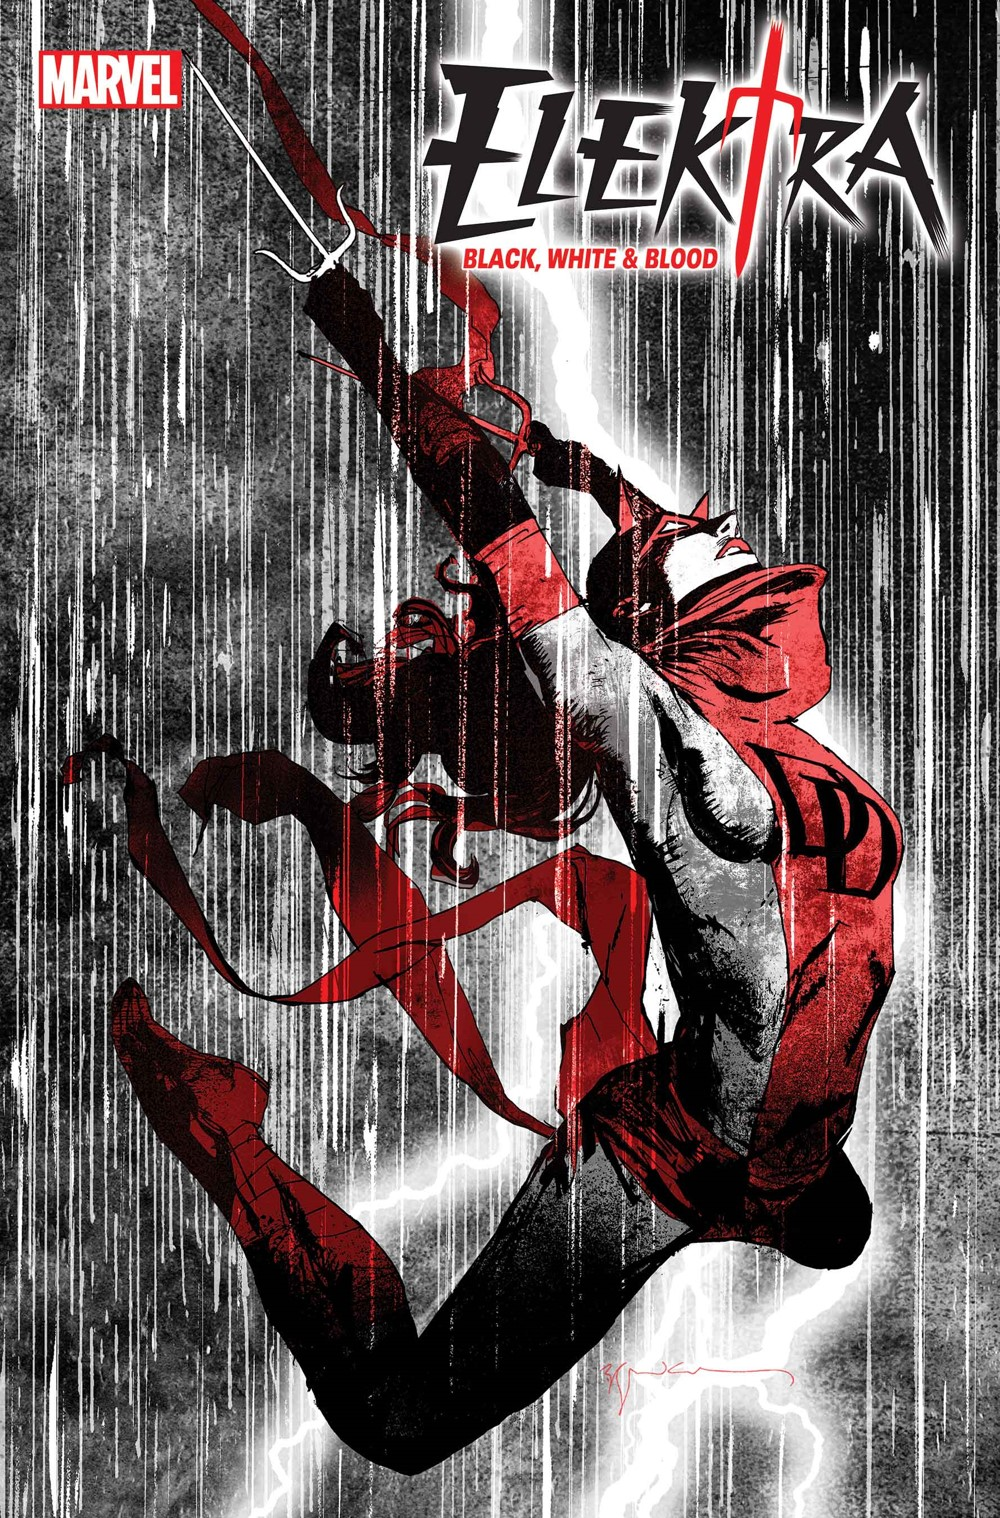 ELEKTRABLKWHBL001_SIENKIEWICZ Marvel Comics December 2021 Solicitations